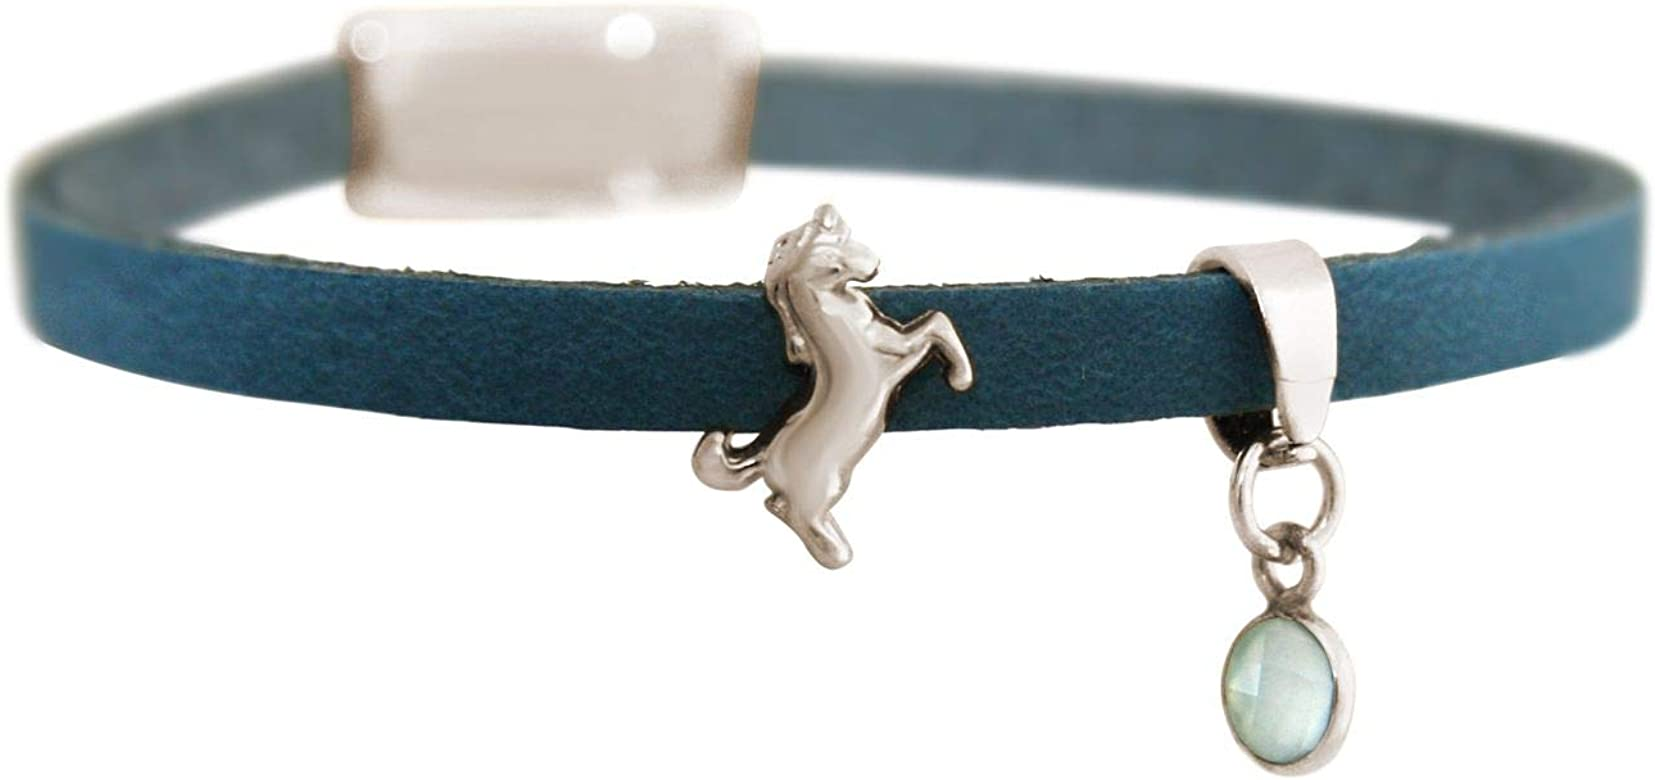 Gemshine pulsera con Unicornio de plata de ley maciza con cadena. En plata rodiada, chapada en oro o en oro rosa de 18k. Hecho a mano en España. Estuche de regalo, Color